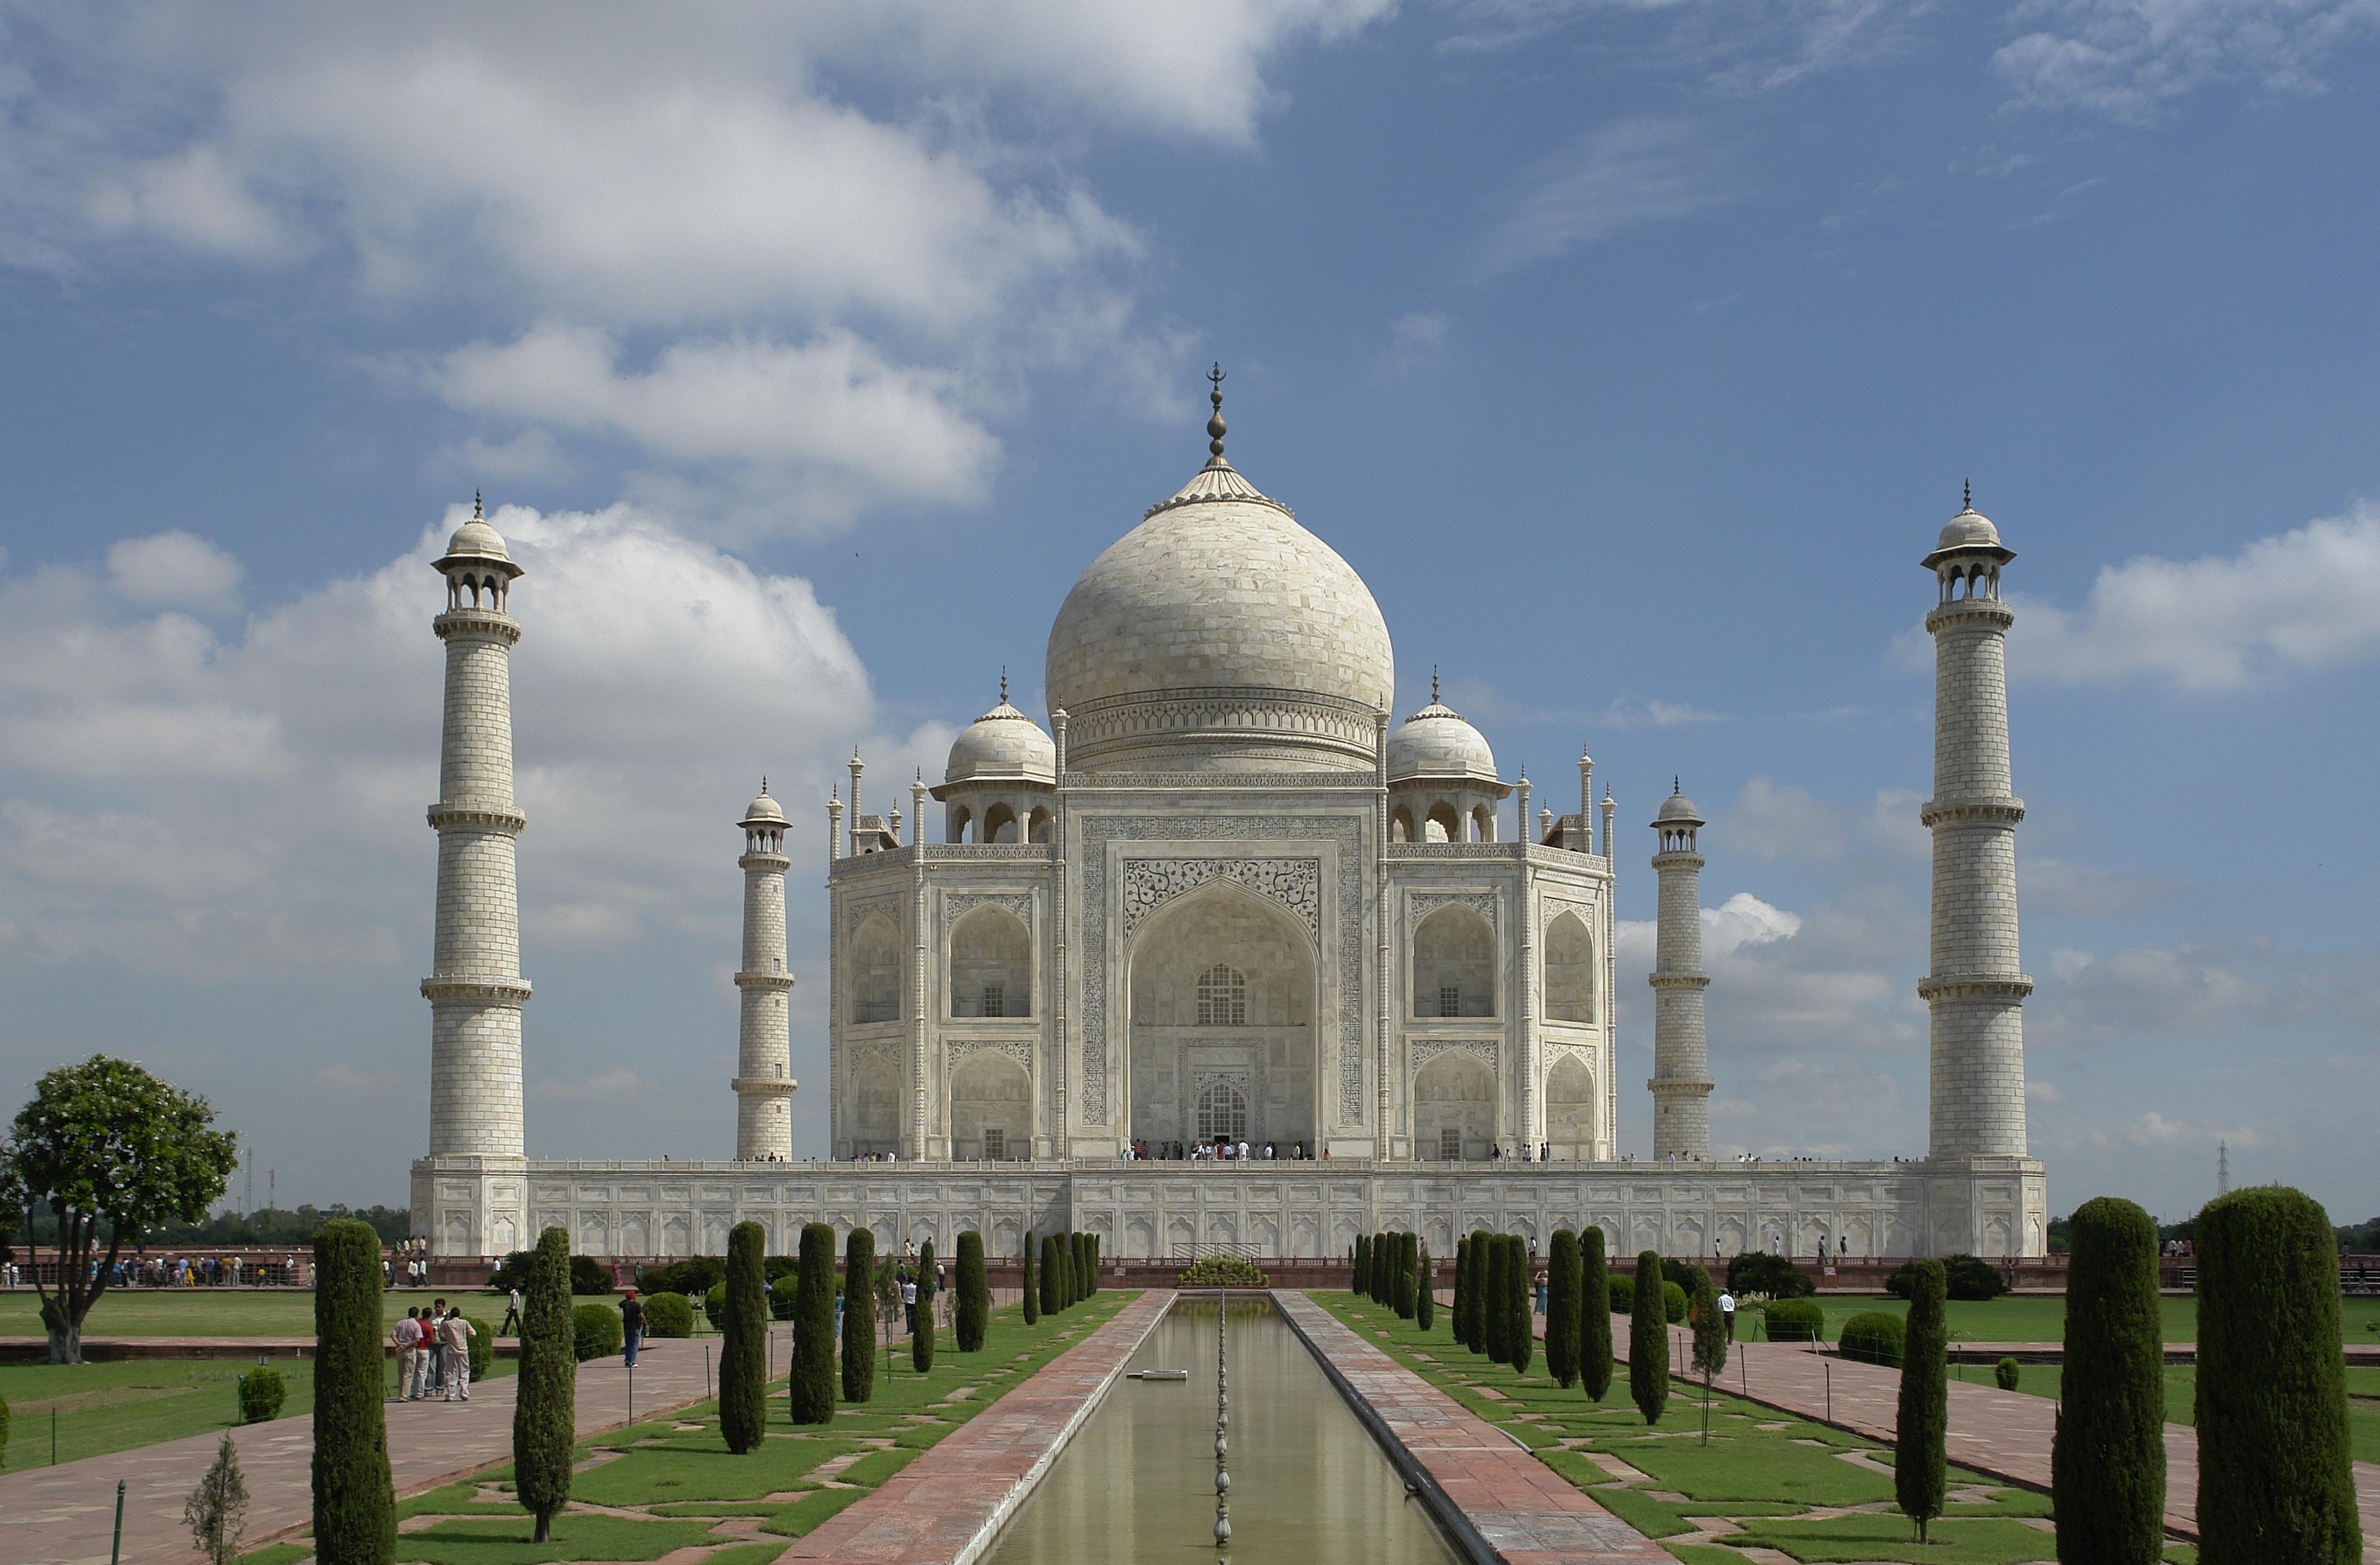 http://upload.wikimedia.org/wikipedia/commons/6/68/Taj_Mahal,_Agra,_India.jpg